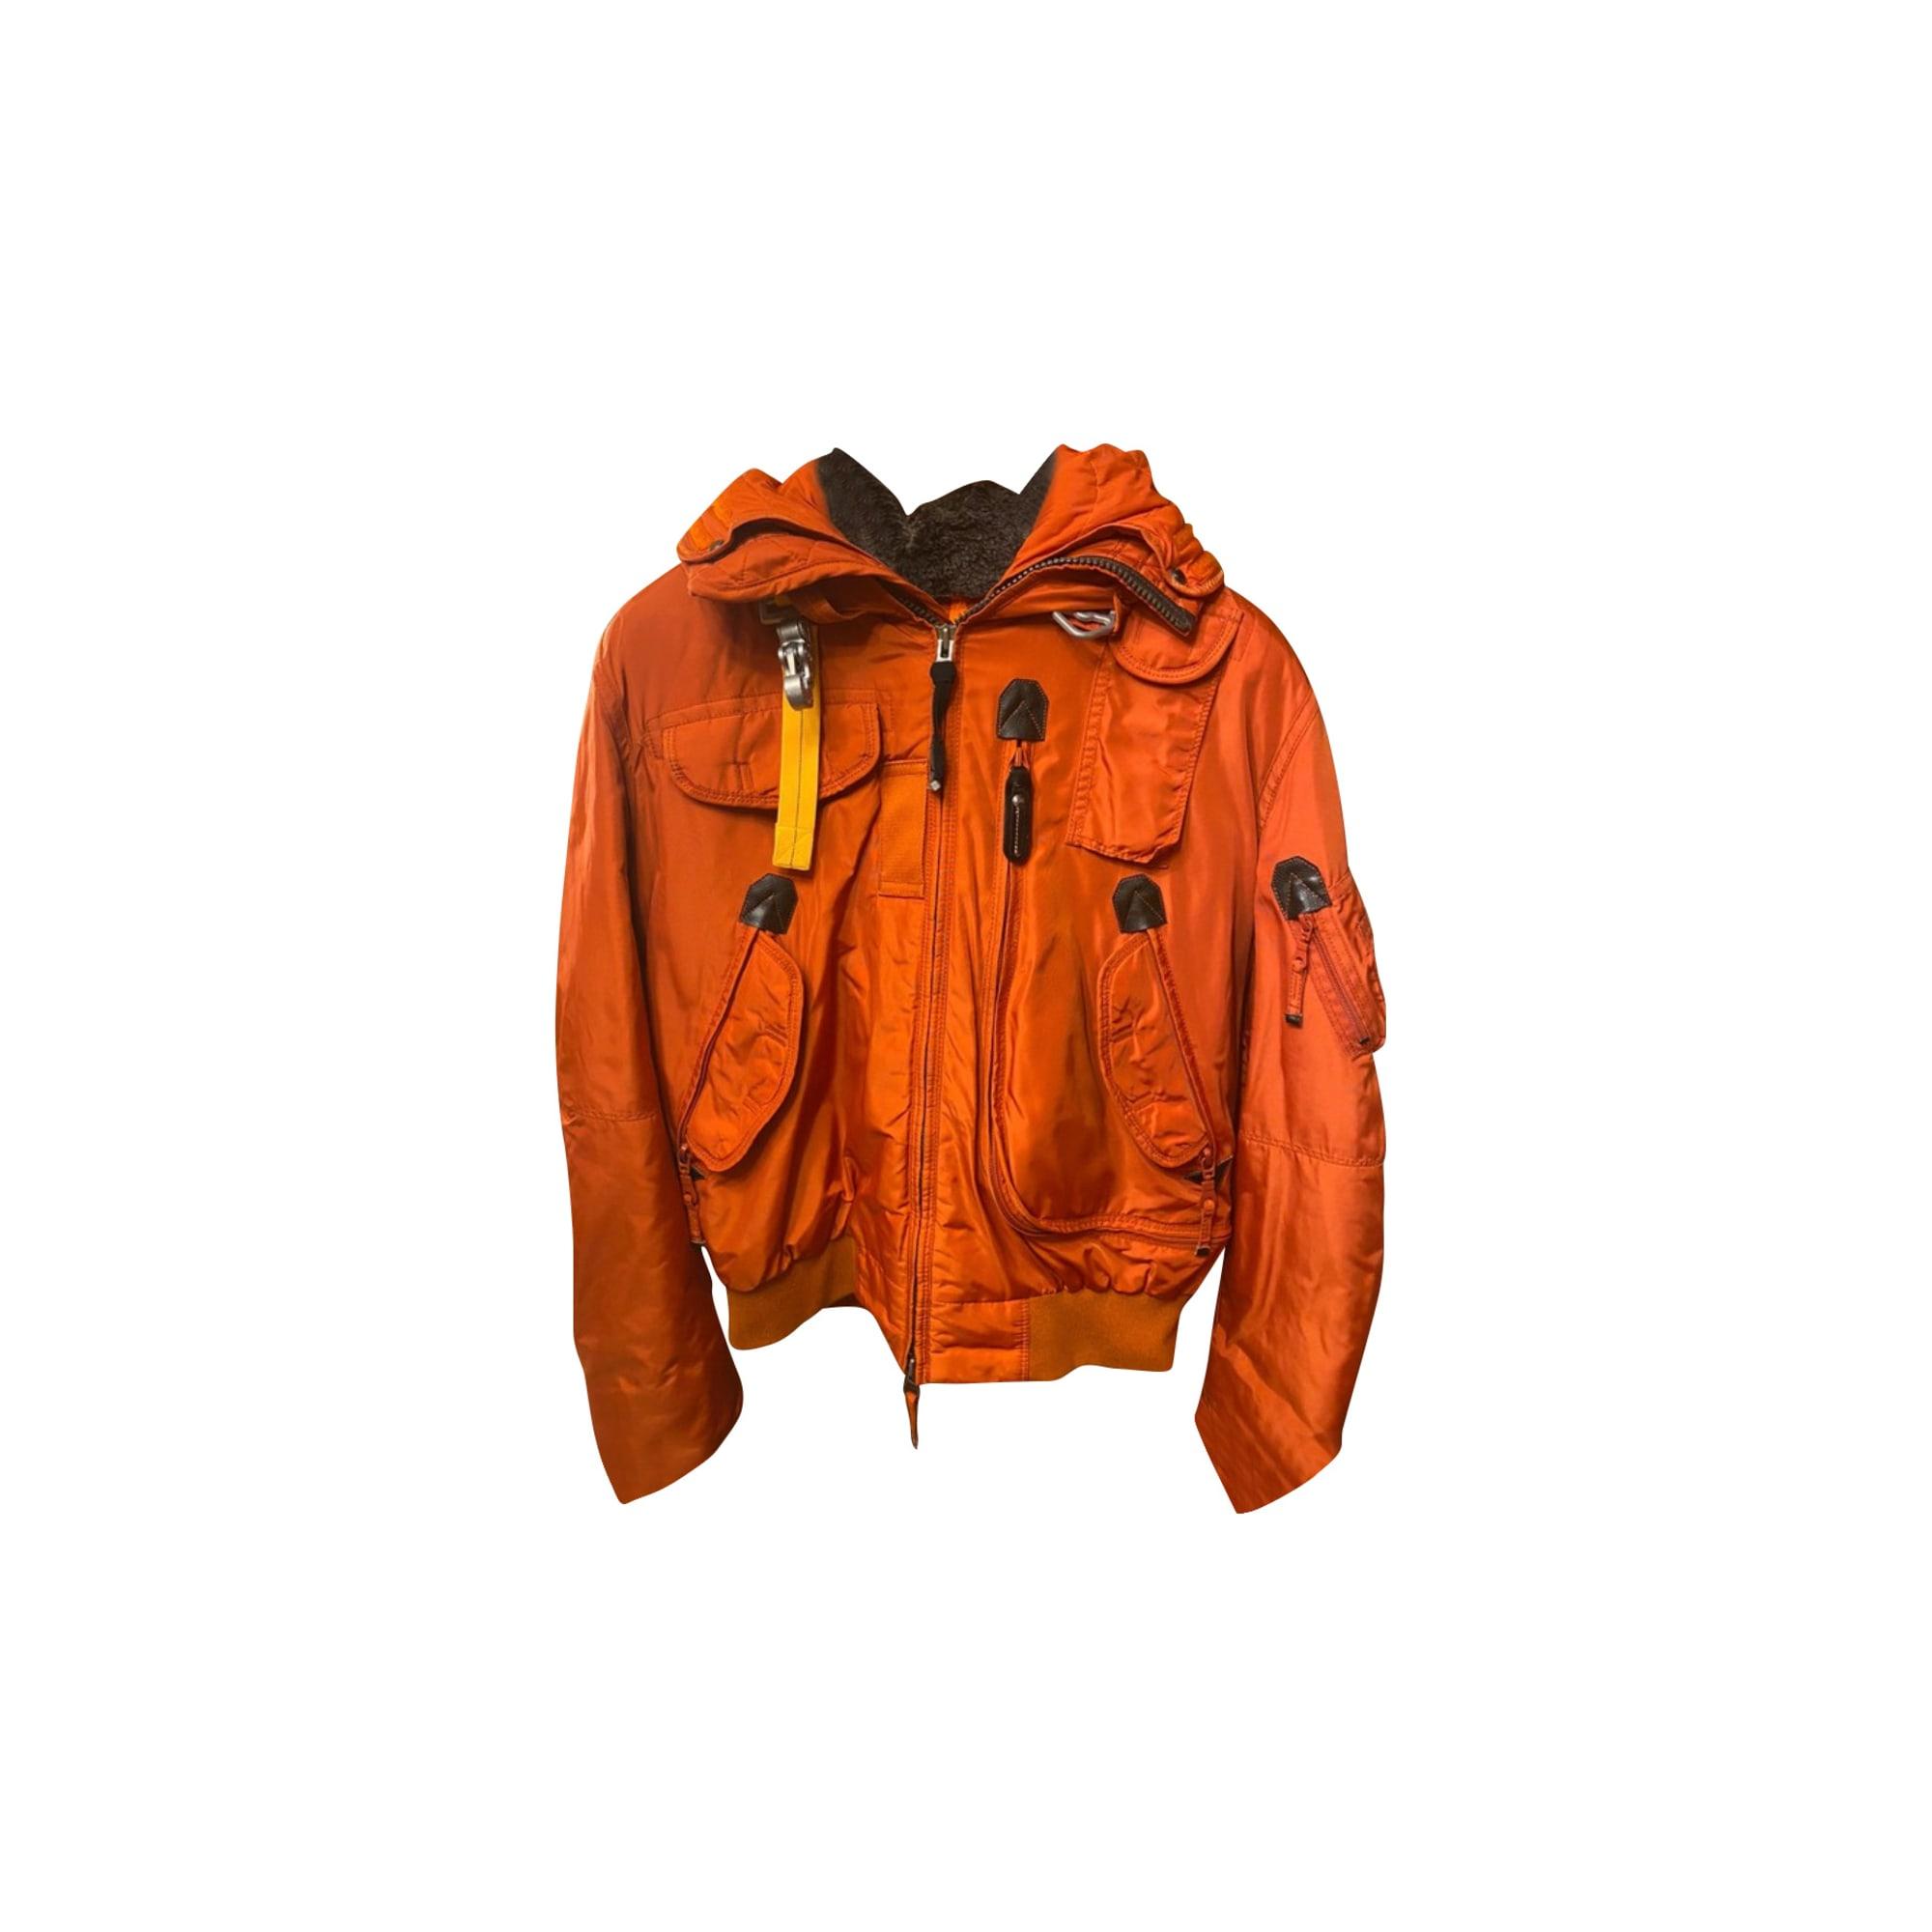 Doudoune PARAJUMPERS Orange